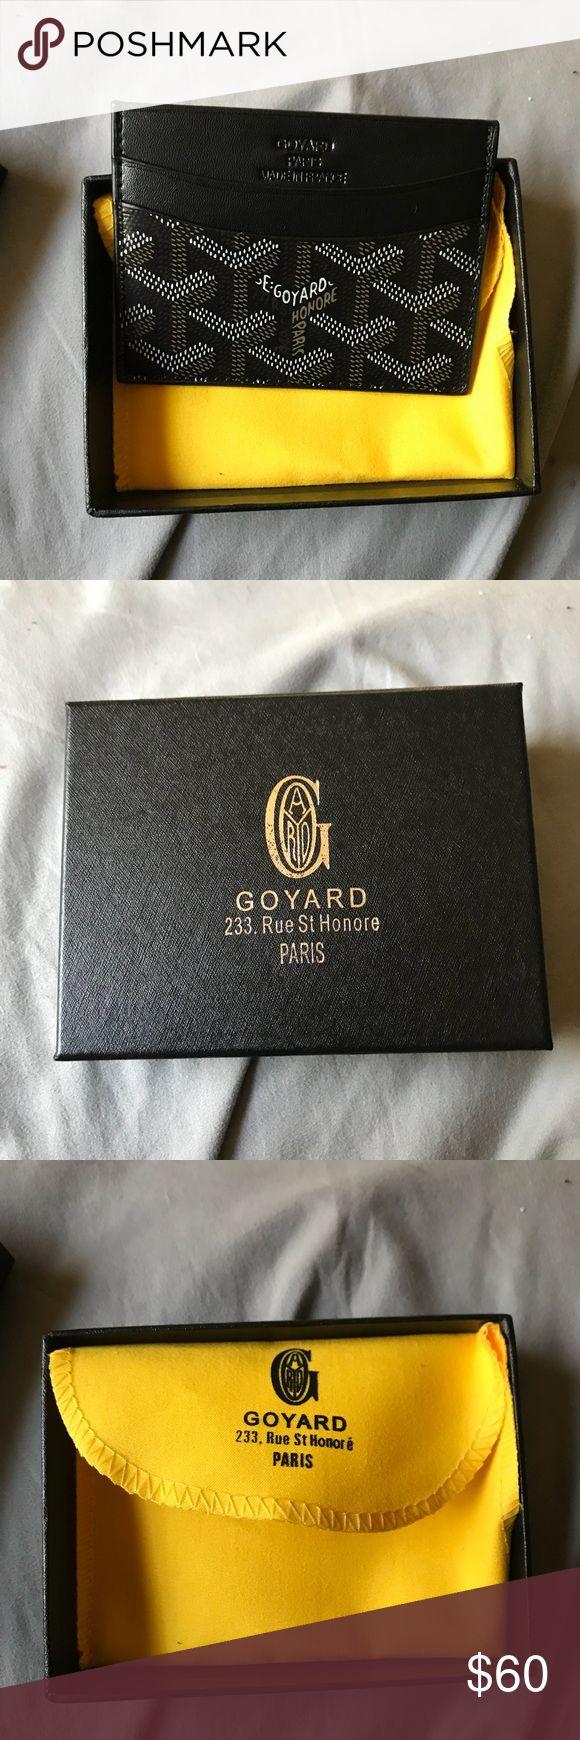 Goyard Wallet Card Holder Black Brand new Goyard Other